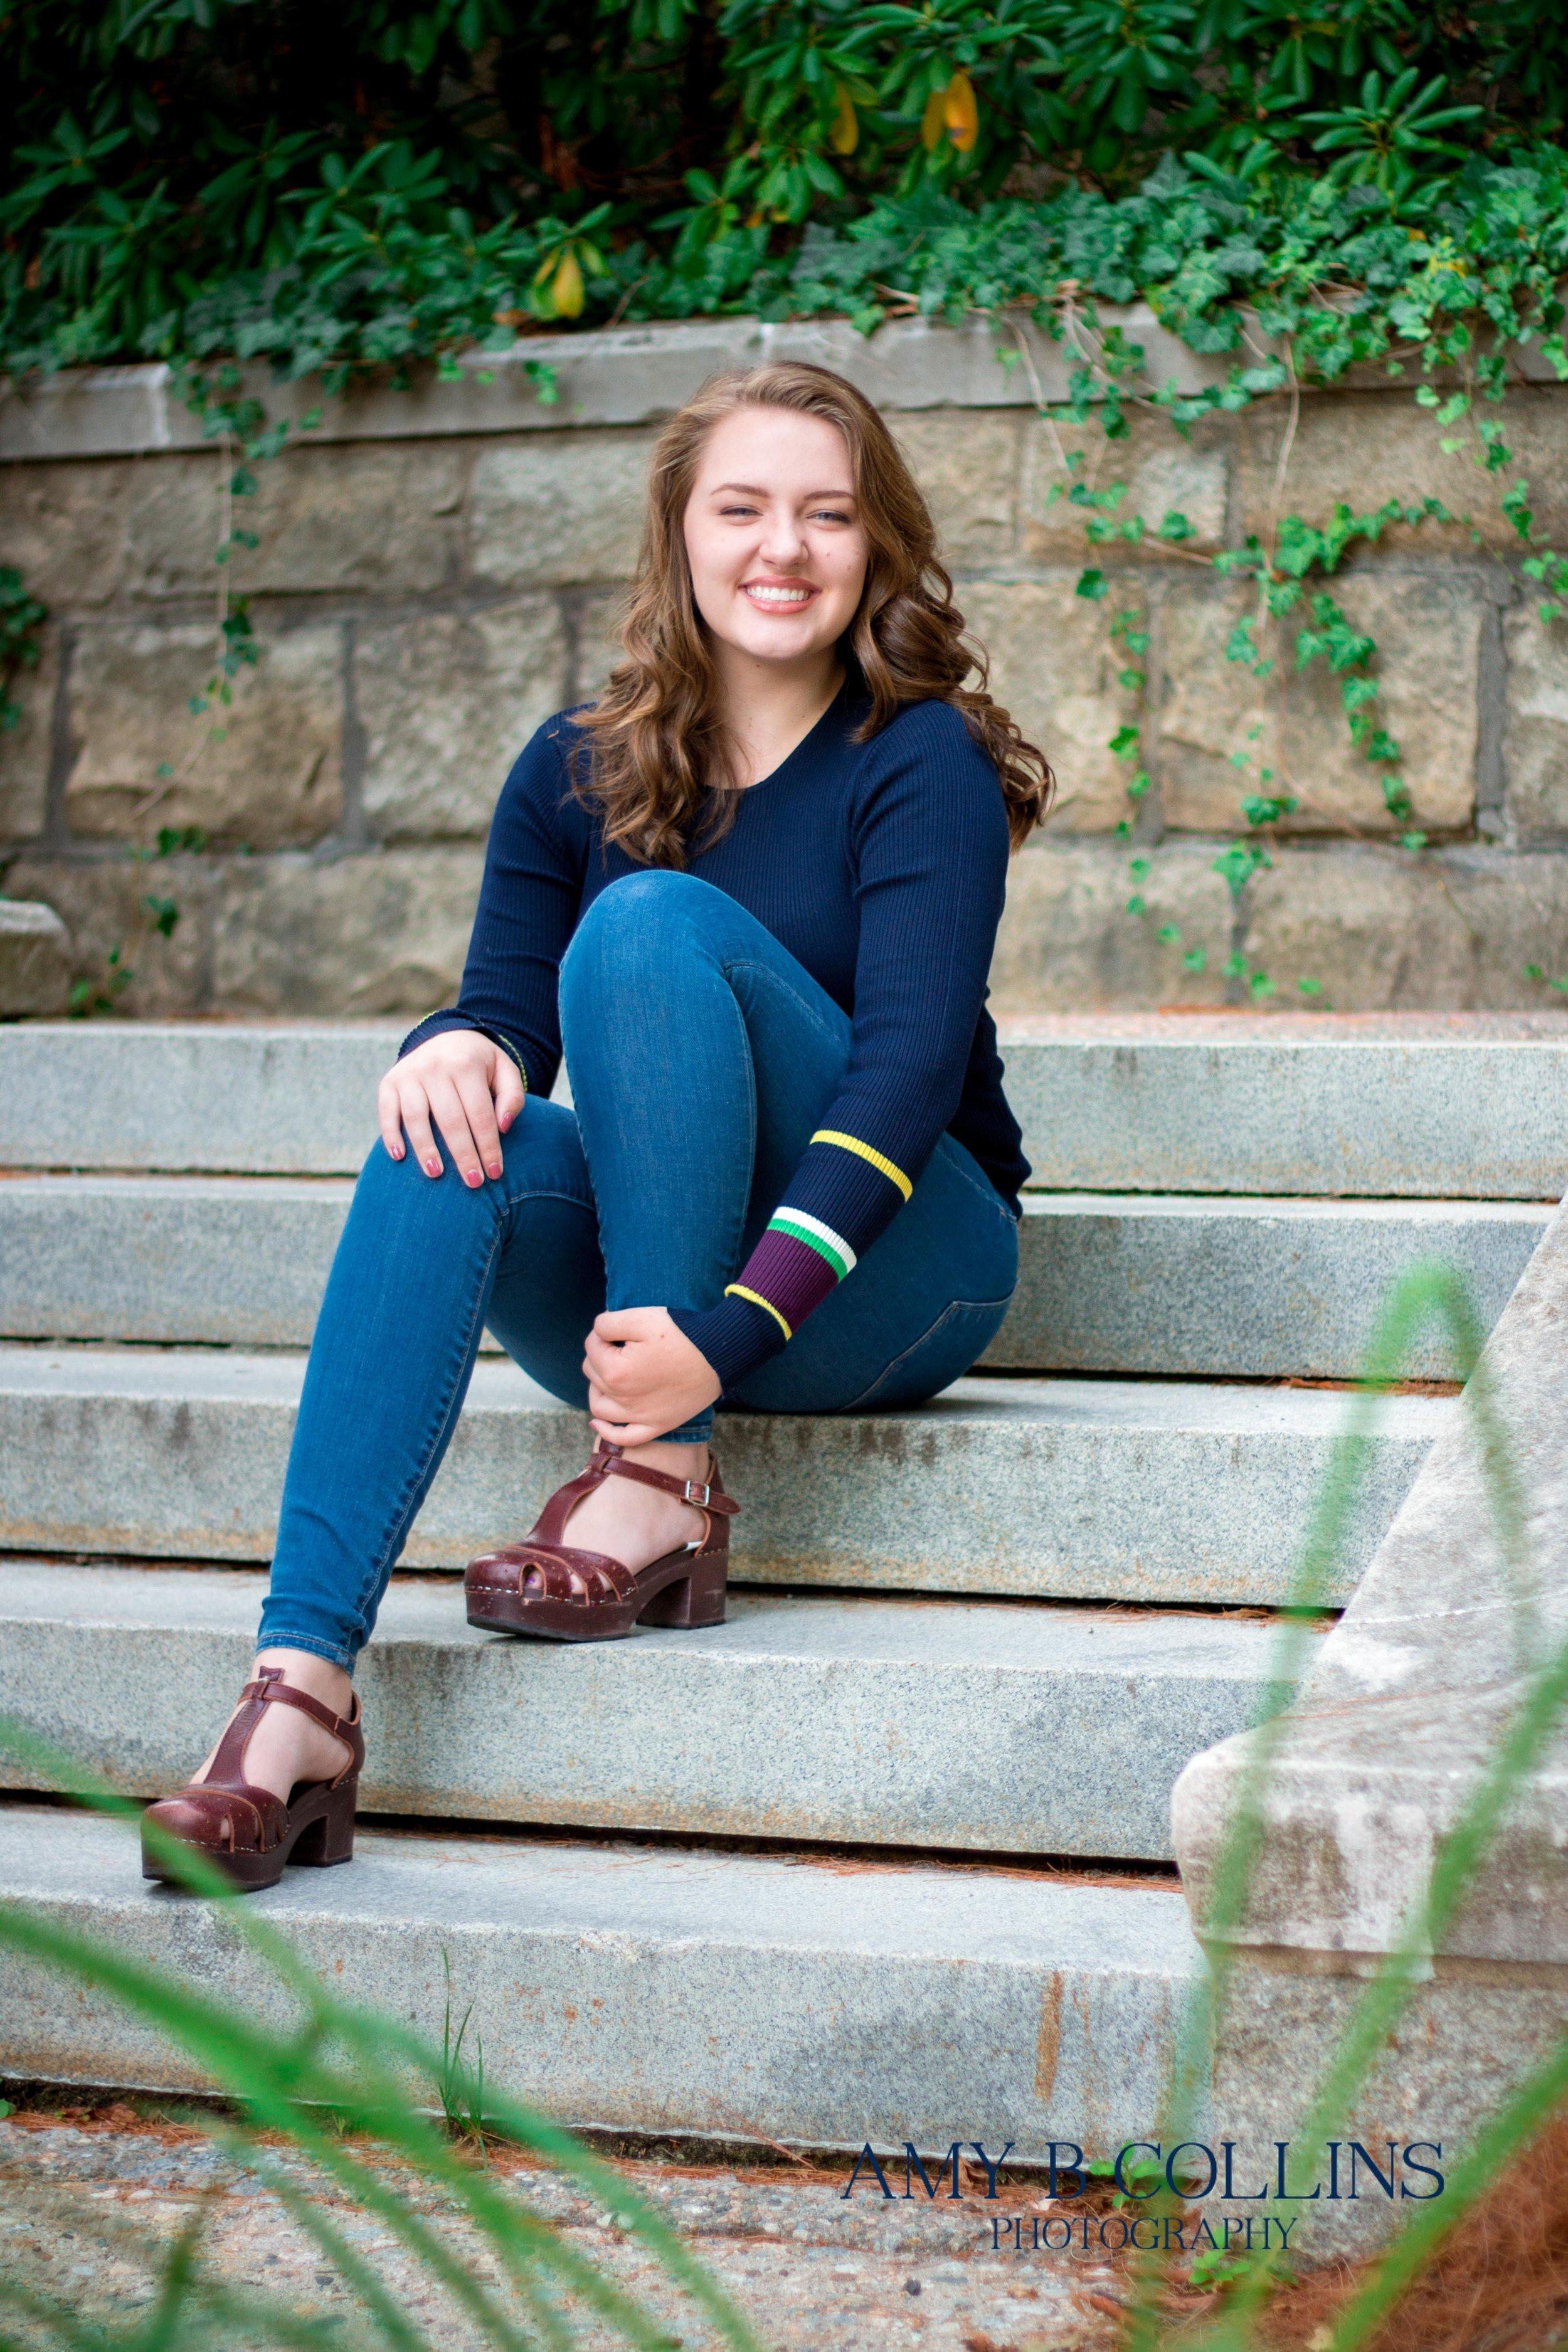 AmyBCollinsPhotography_SeniorSession_Sasha-2.jpg